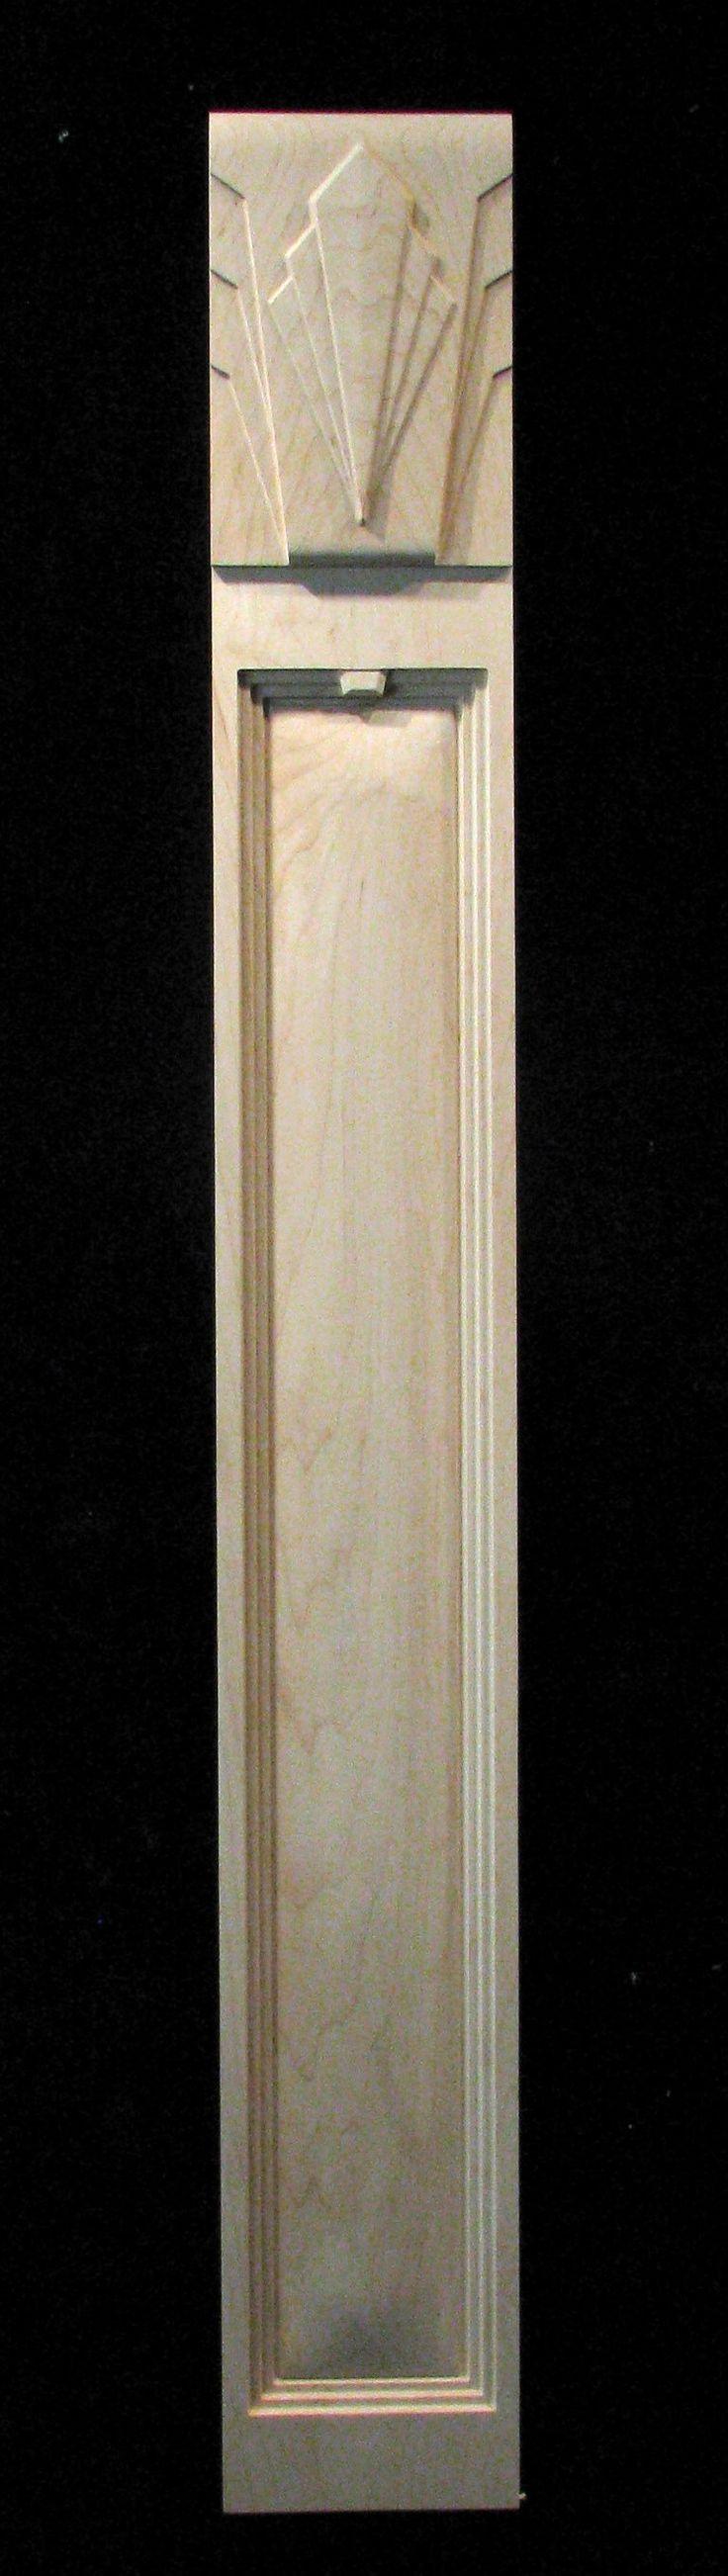 Carved deco pilaster